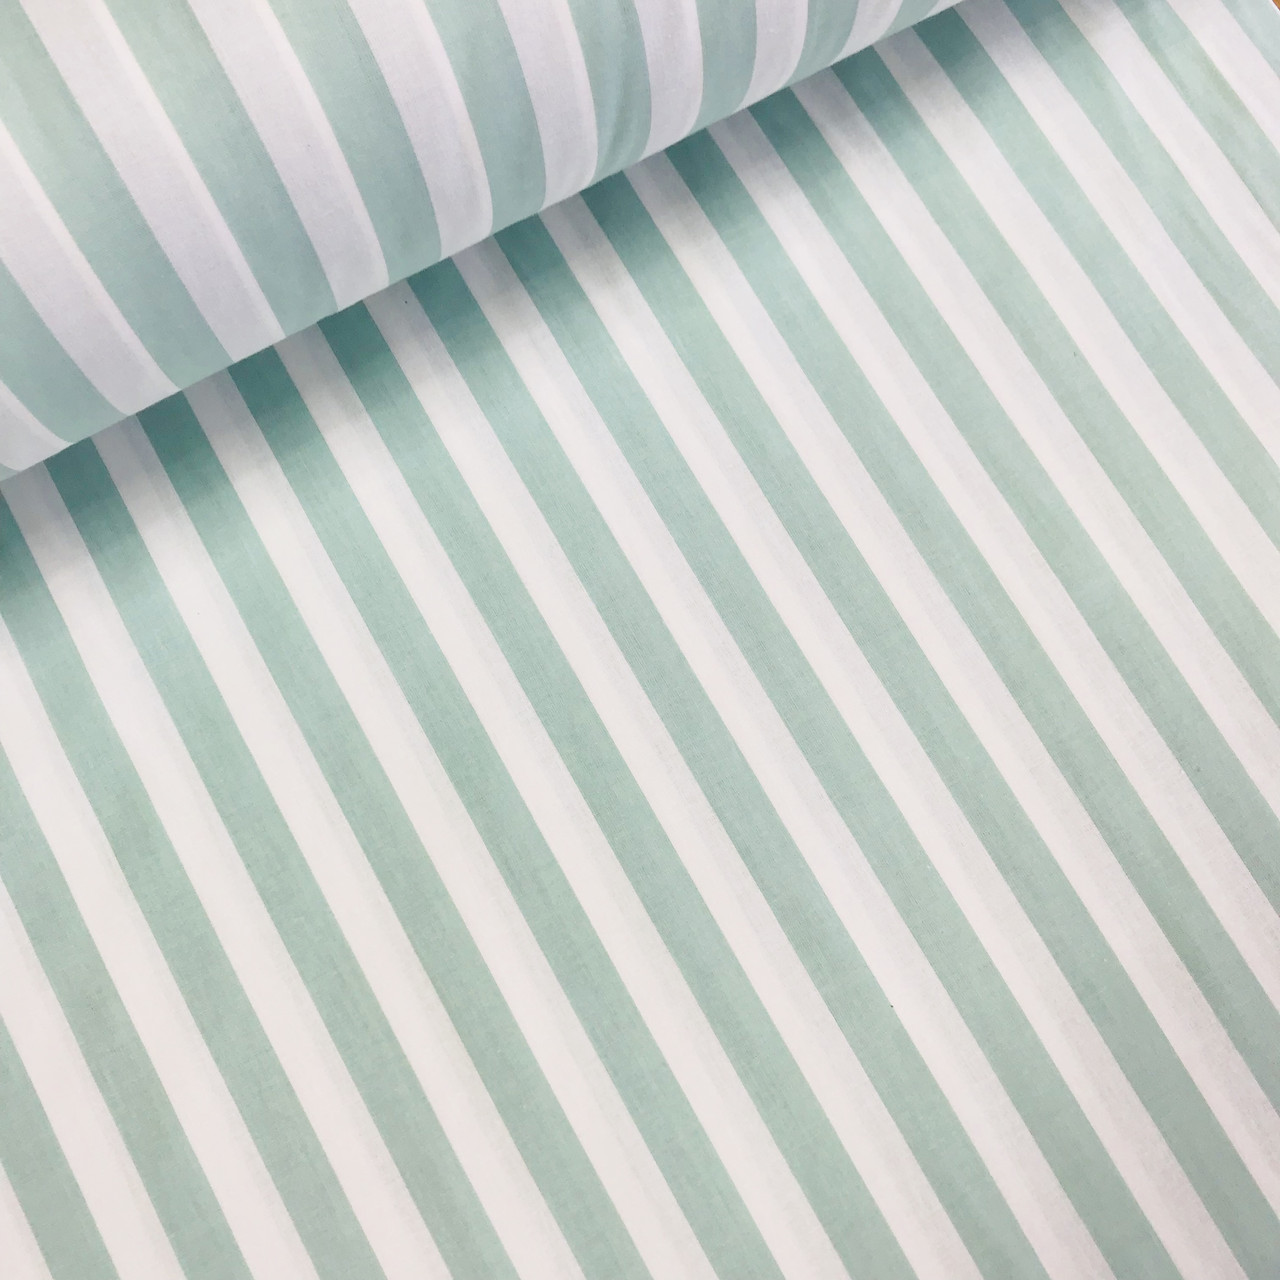 Хлопковая ткань (ТУРЦИЯ шир. 2,4 м) полоска мята 14 мм